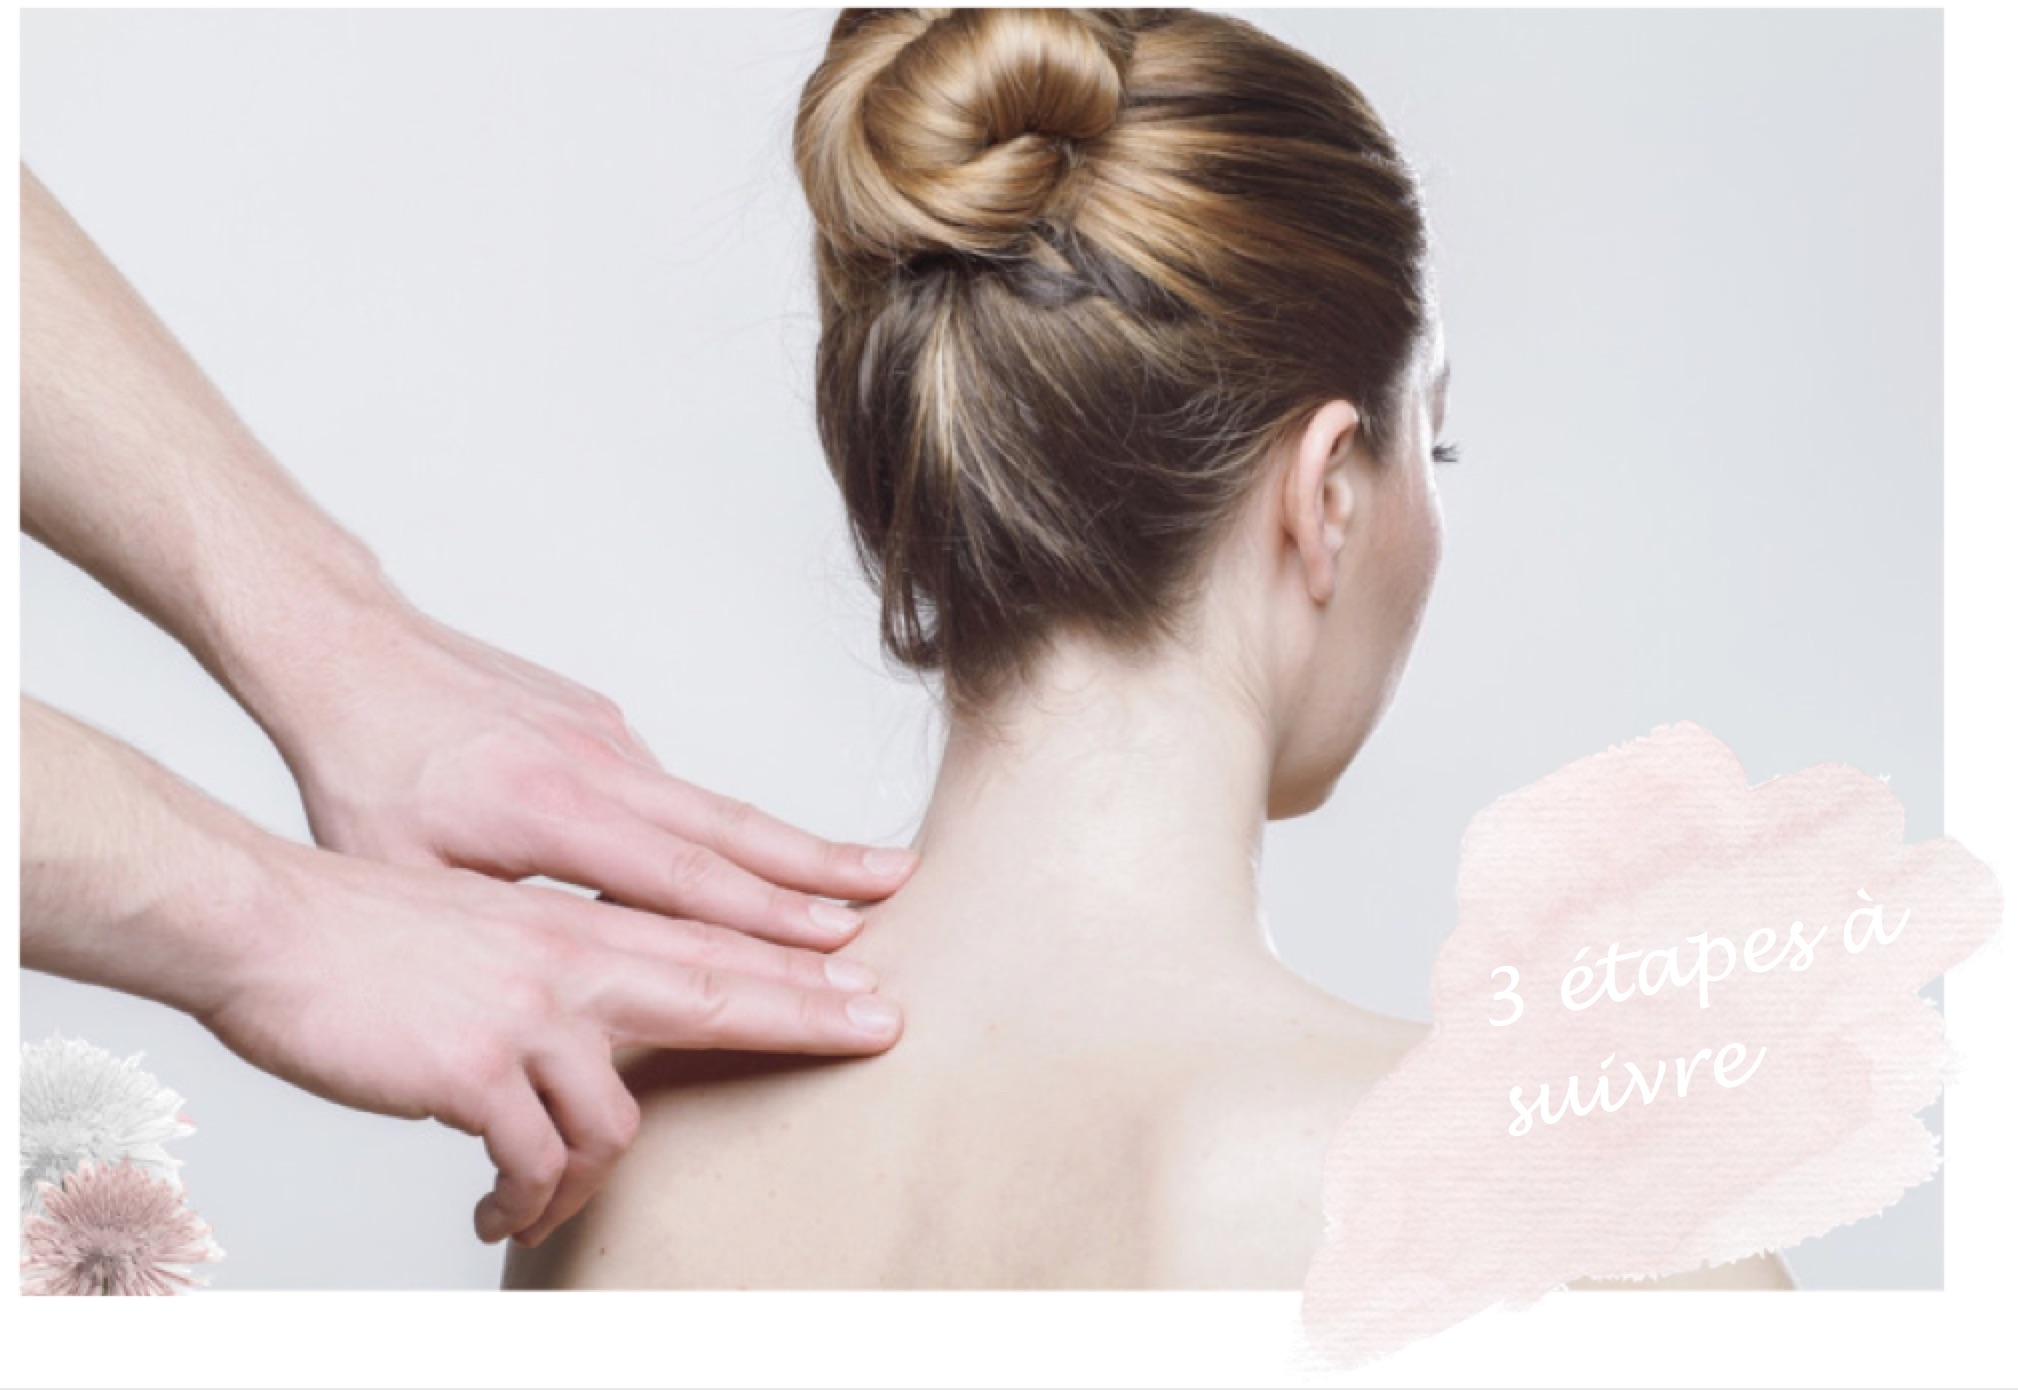 Comment soigner son mal de dos